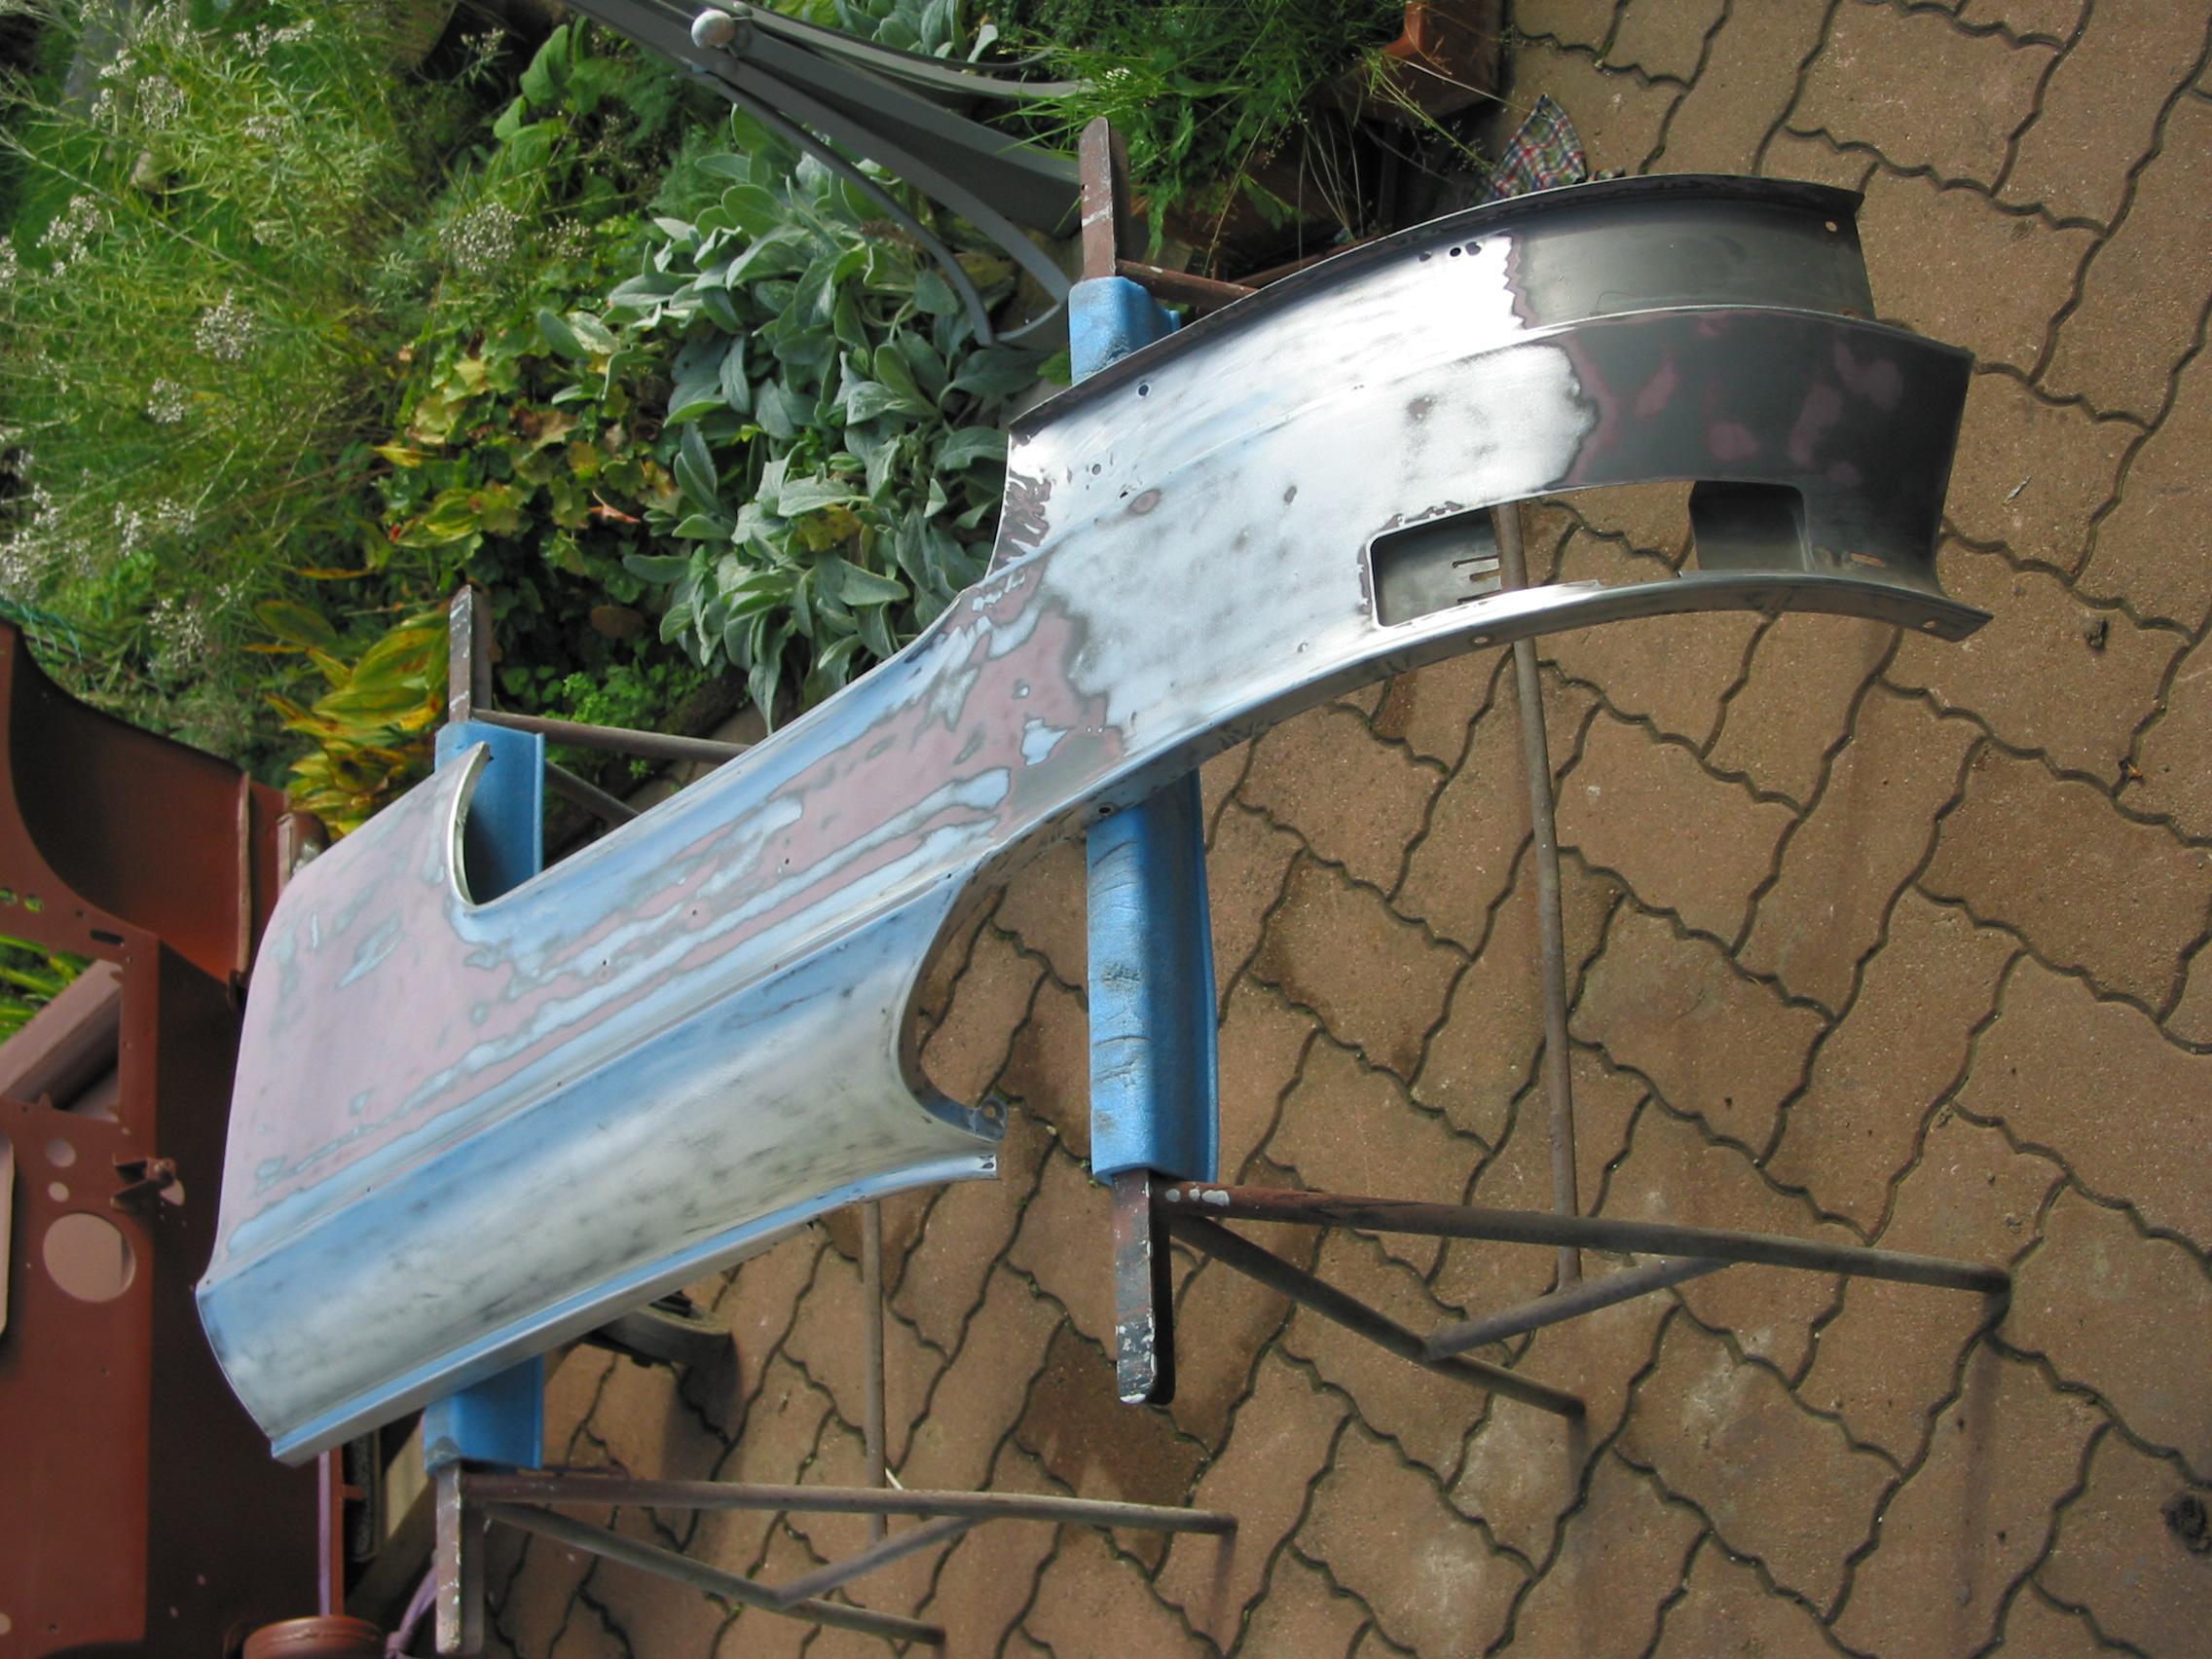 g010lexterieurdelailearriereencoursdeponageblanc.jpg